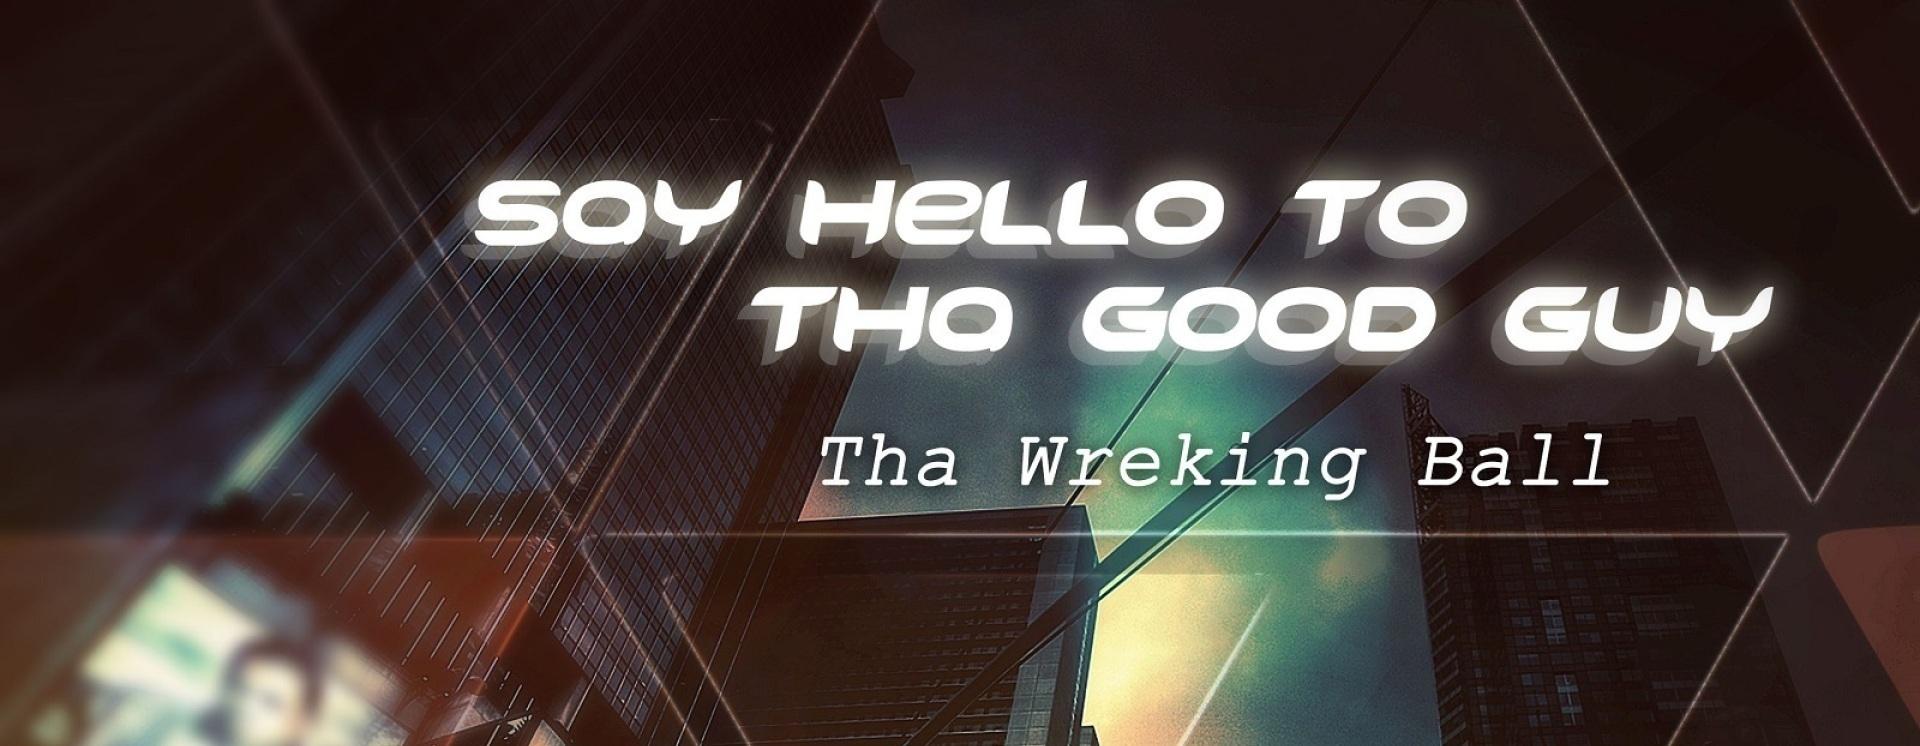 1405363320 say hello to tha good guy final album cover copy